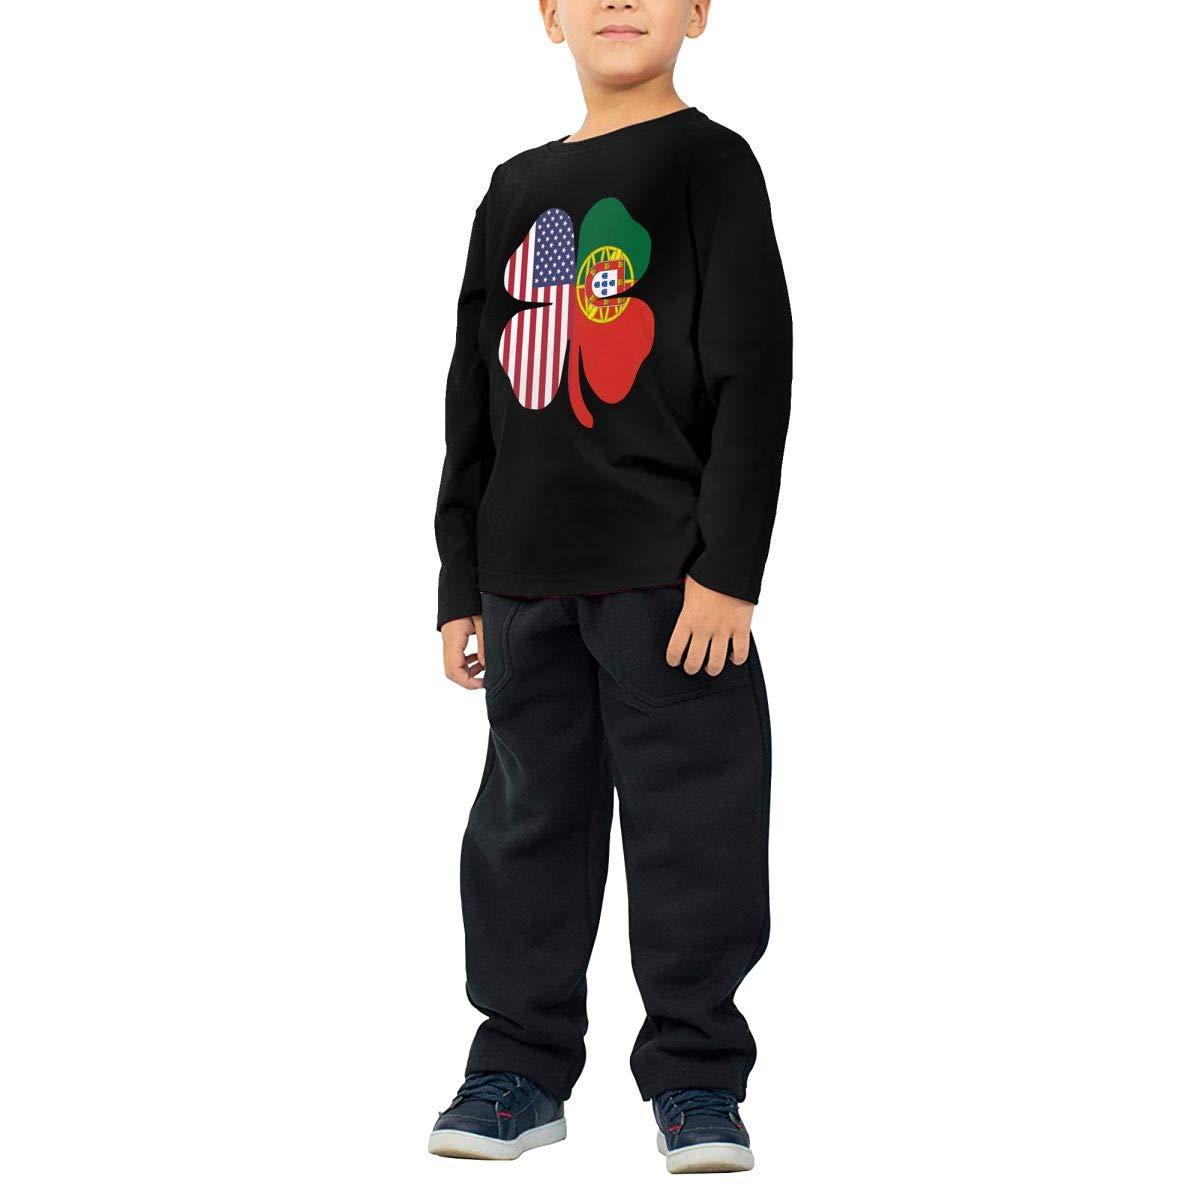 CERTONGCXTS Baby Boys Kids American Portugal Flag Shamrock ComfortSoft Long Sleeve Tee